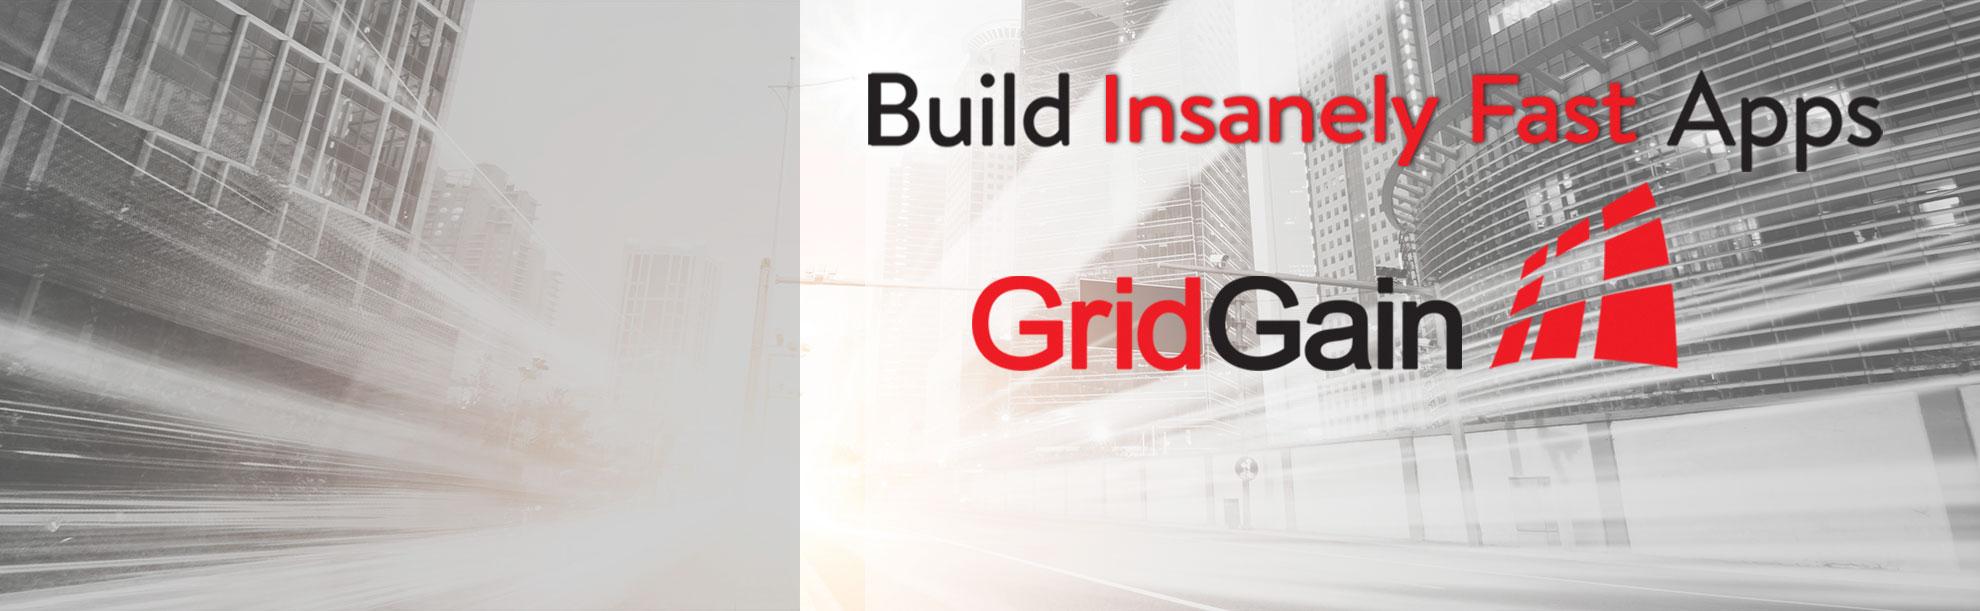 slider_GridGain_billboard